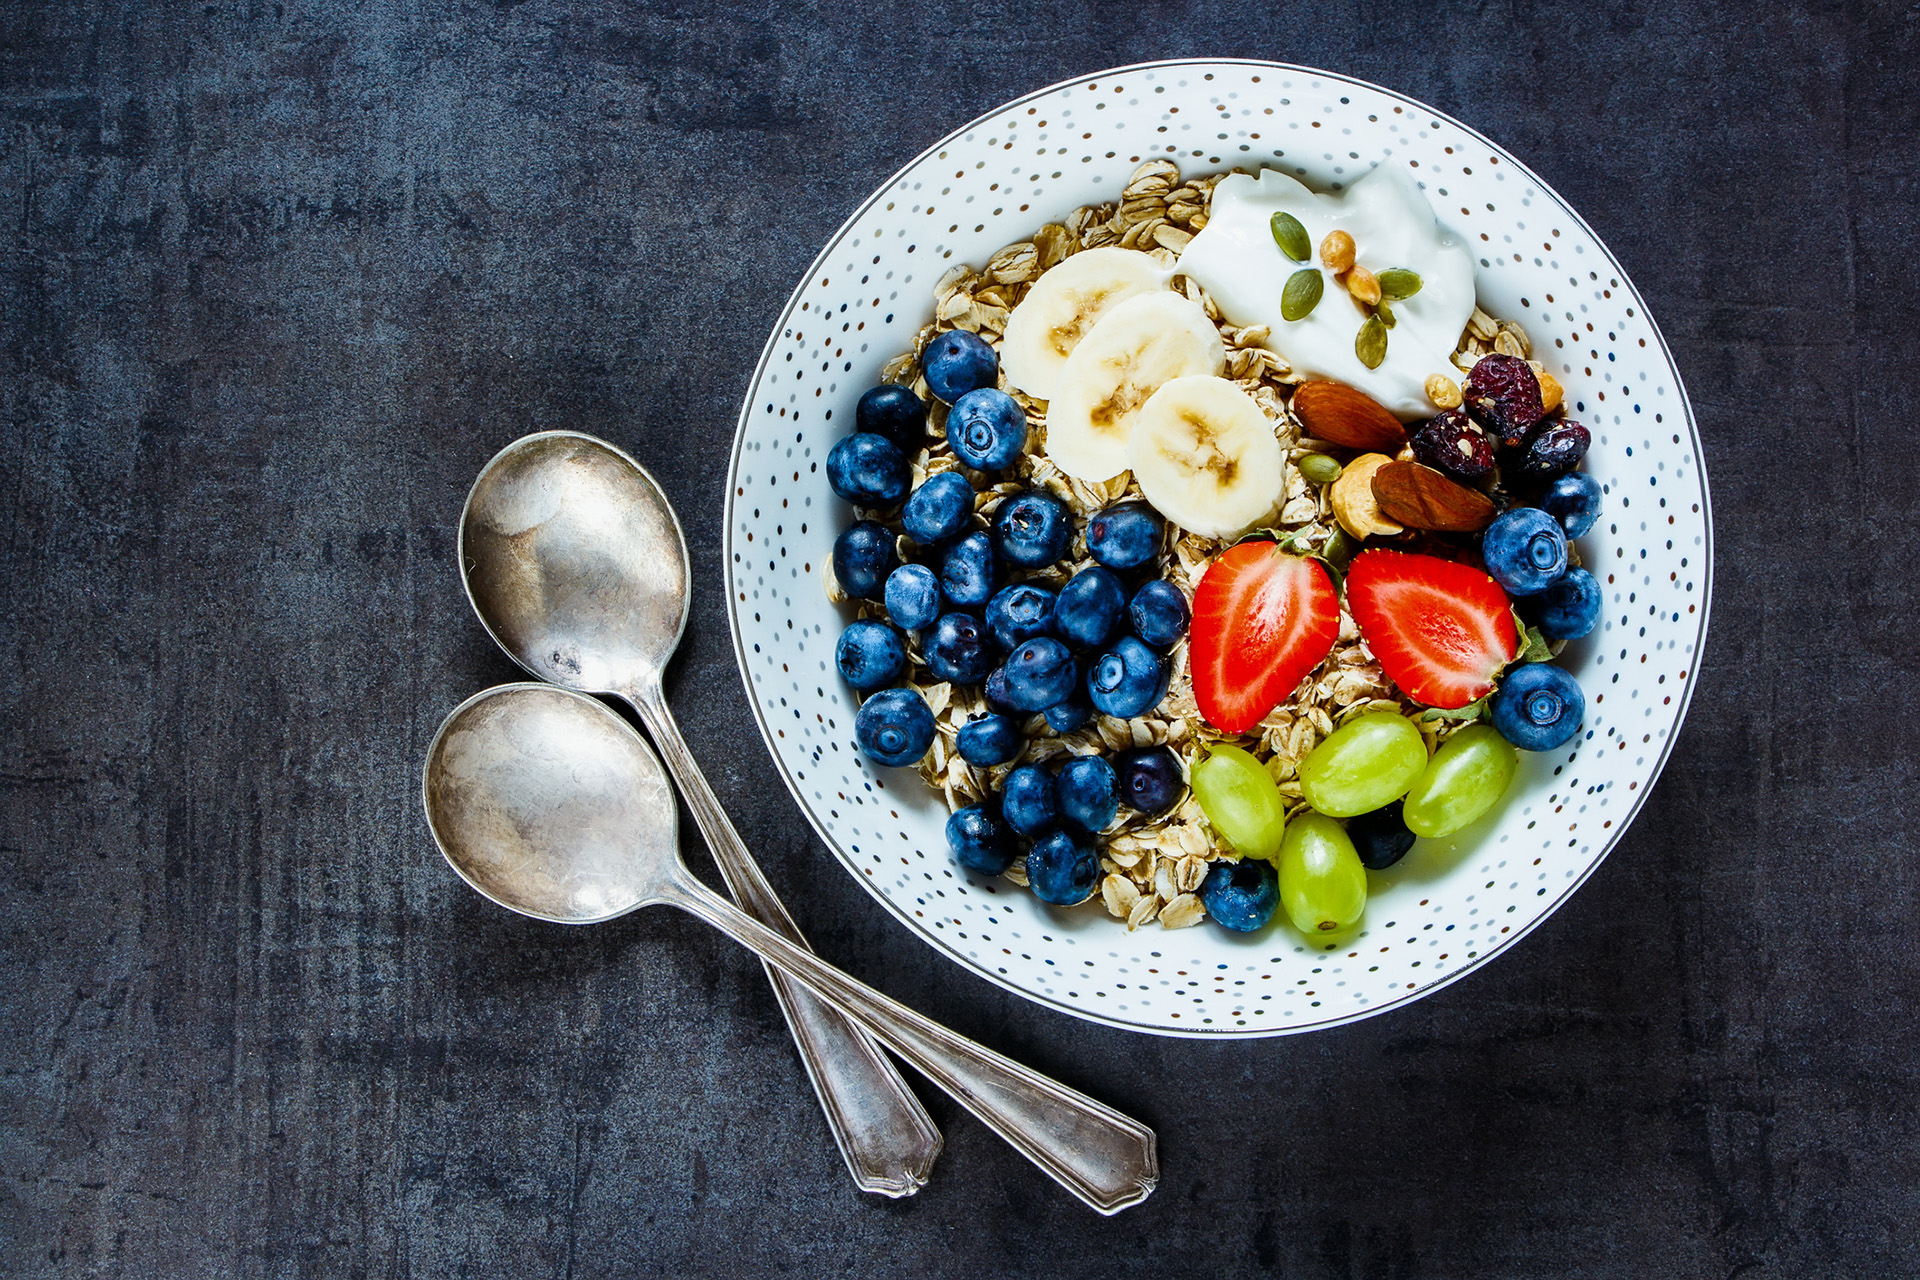 Plate of oat flakes, berries with yogurt and seeds for tasty breakfast on dark vintage background - Healthy food, Diet, Detox, Clean Eating or Vegetarian concept.